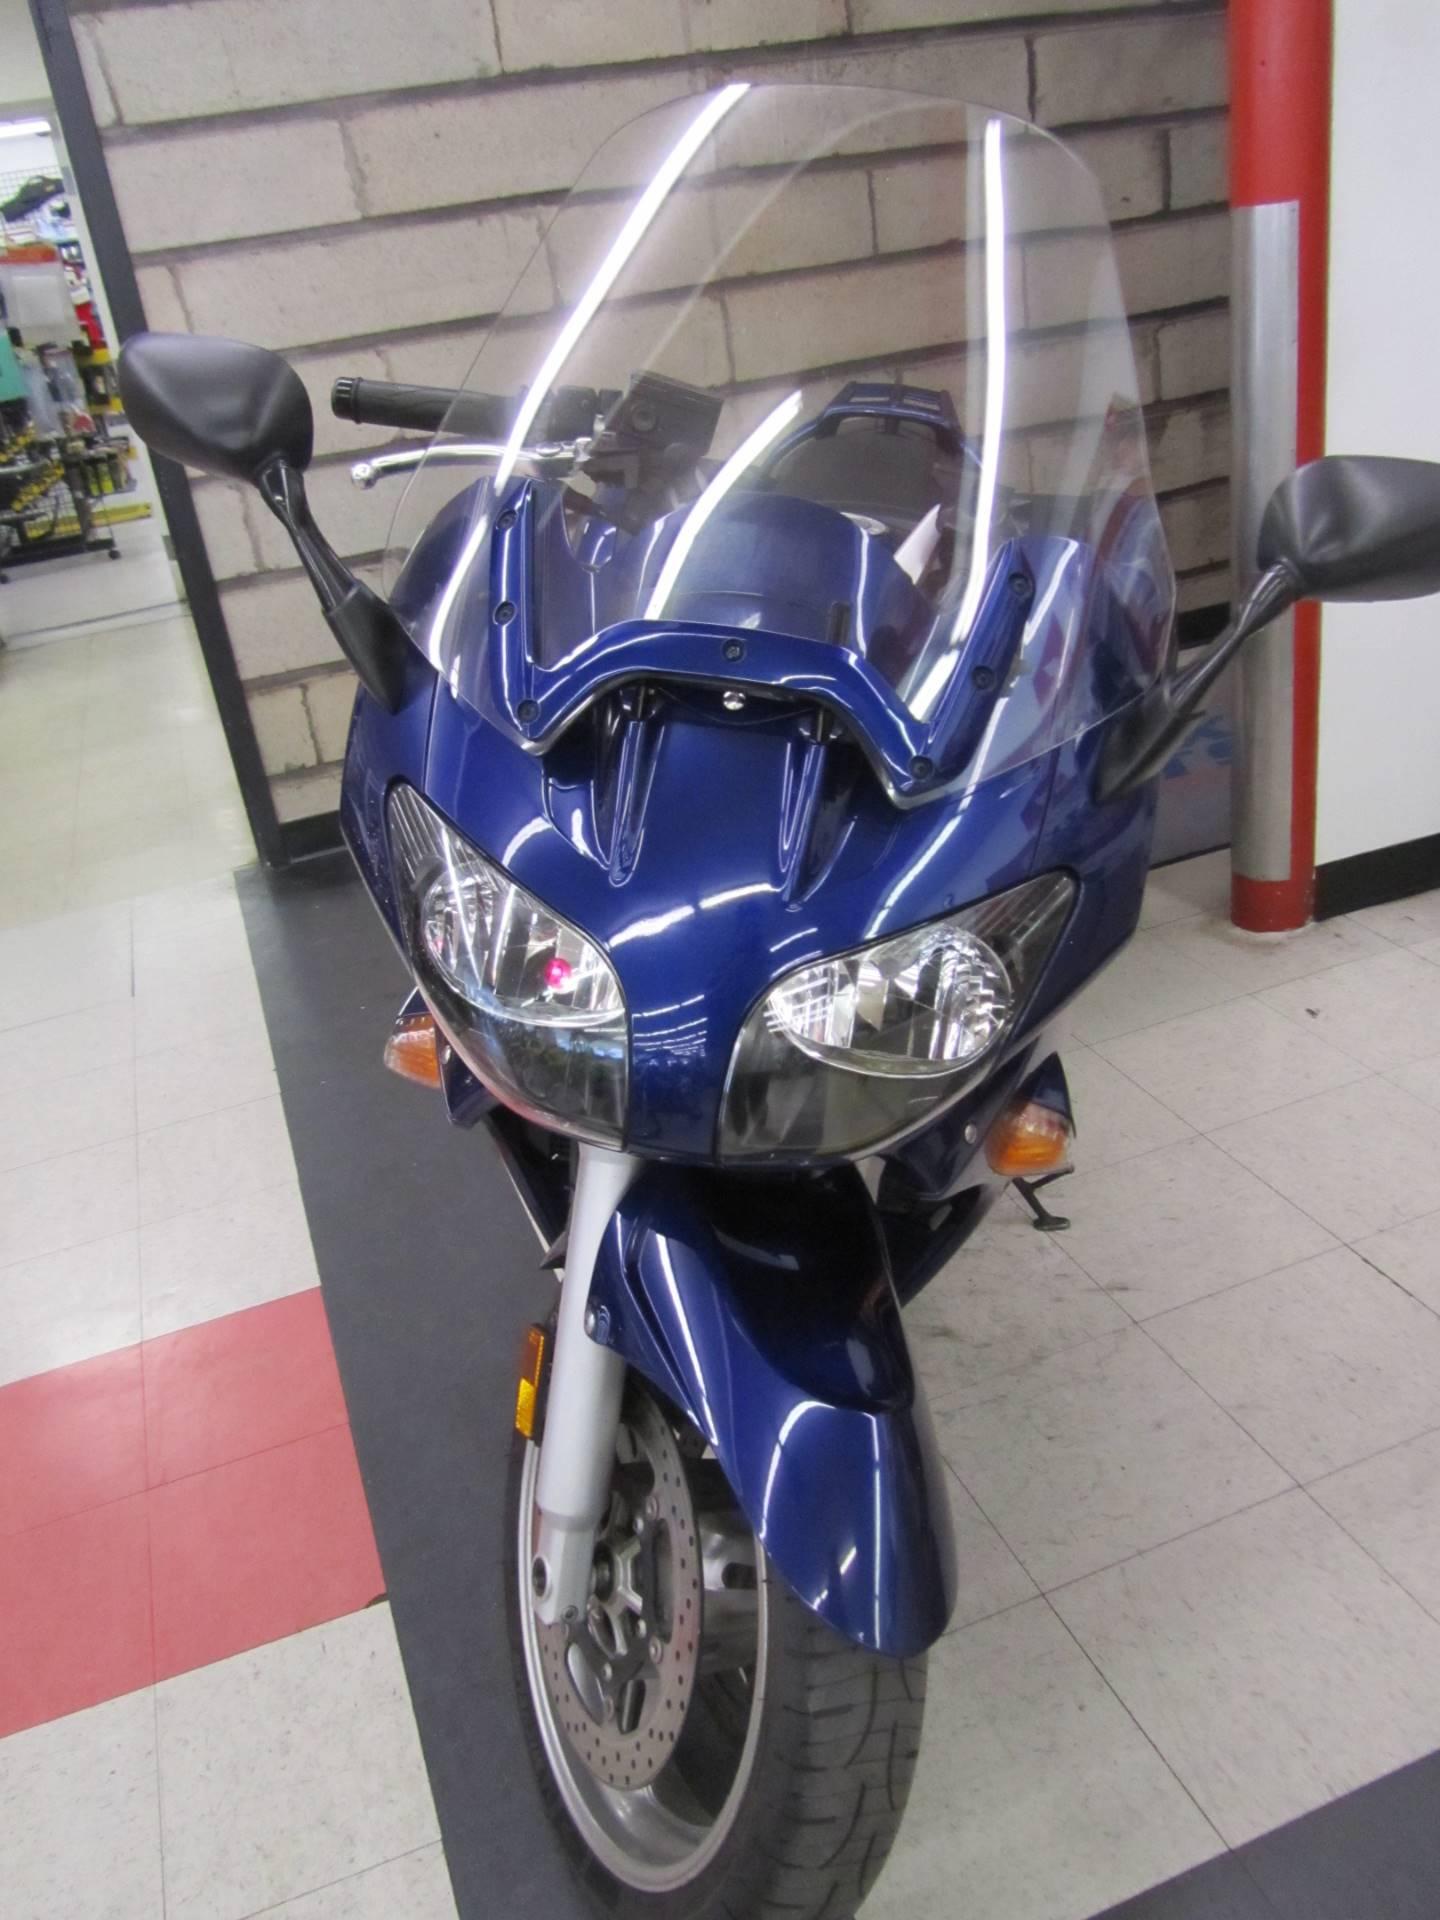 2005 Yamaha FJR 1300A 4